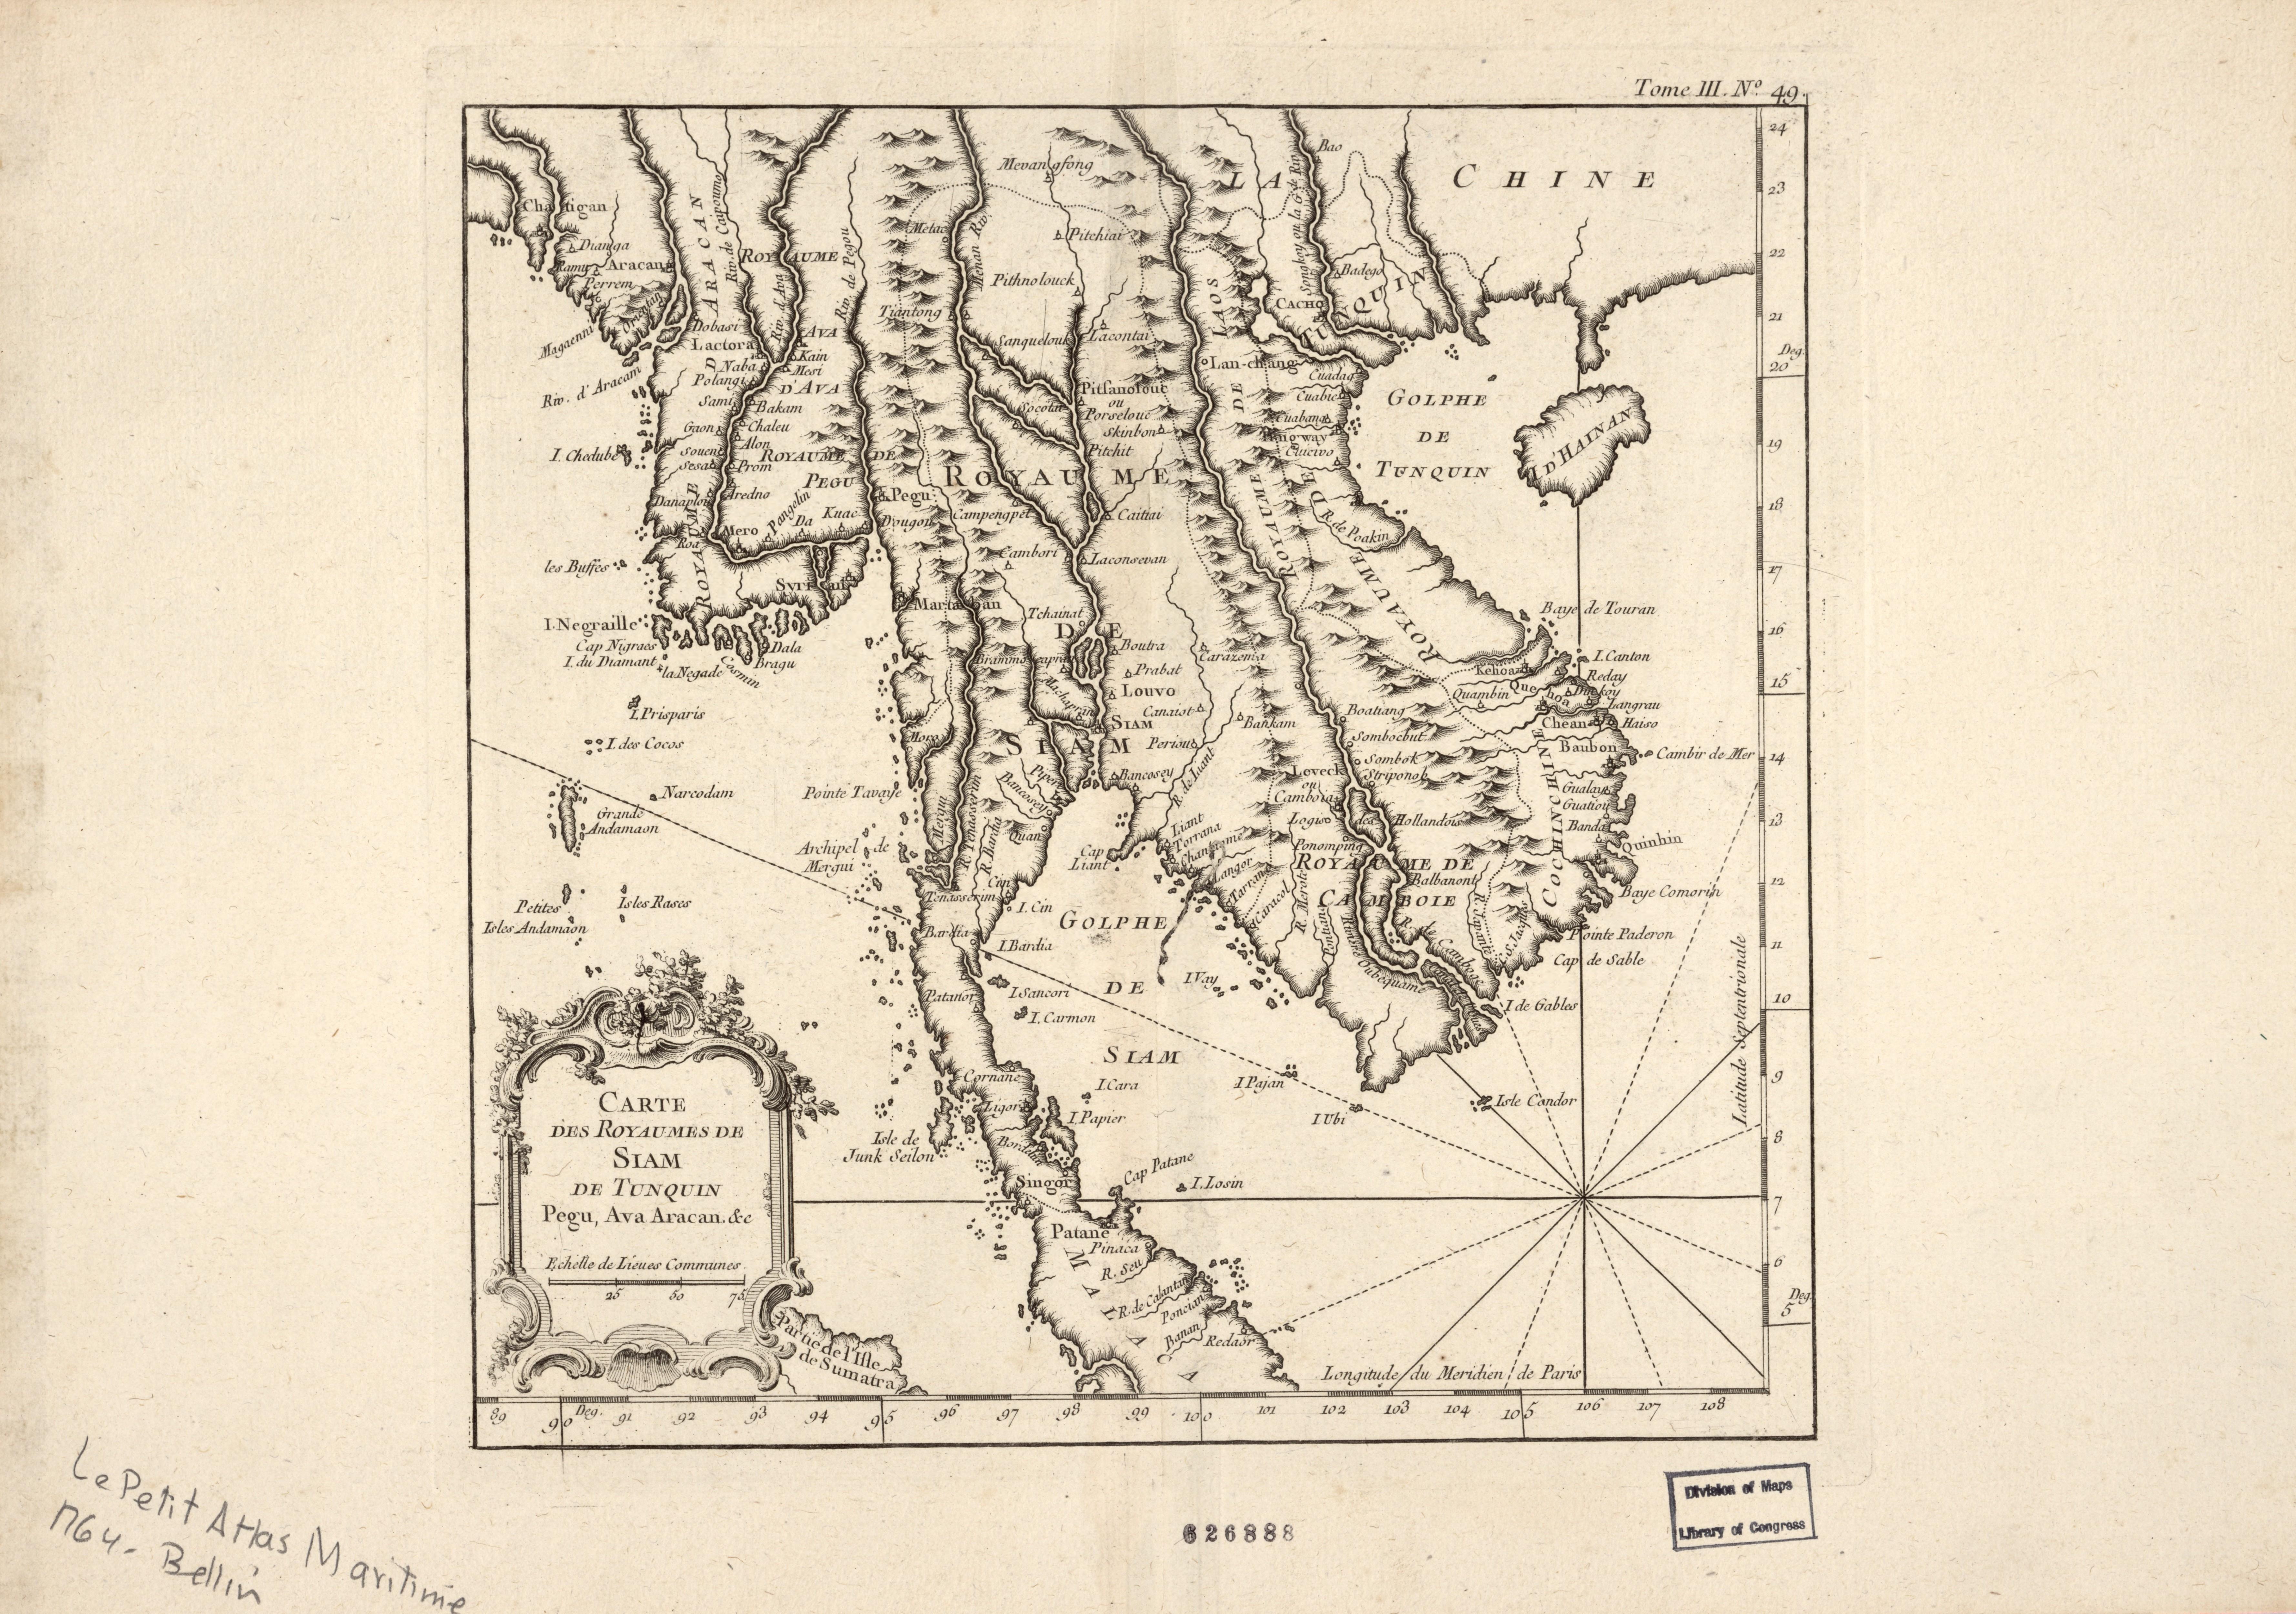 http://upload.wikimedia.org/wikipedia/commons/4/44/Carte_des_royaumes_de_Siam,_de_Tunquin,_Pegu,_Ava_Aracan.jpg